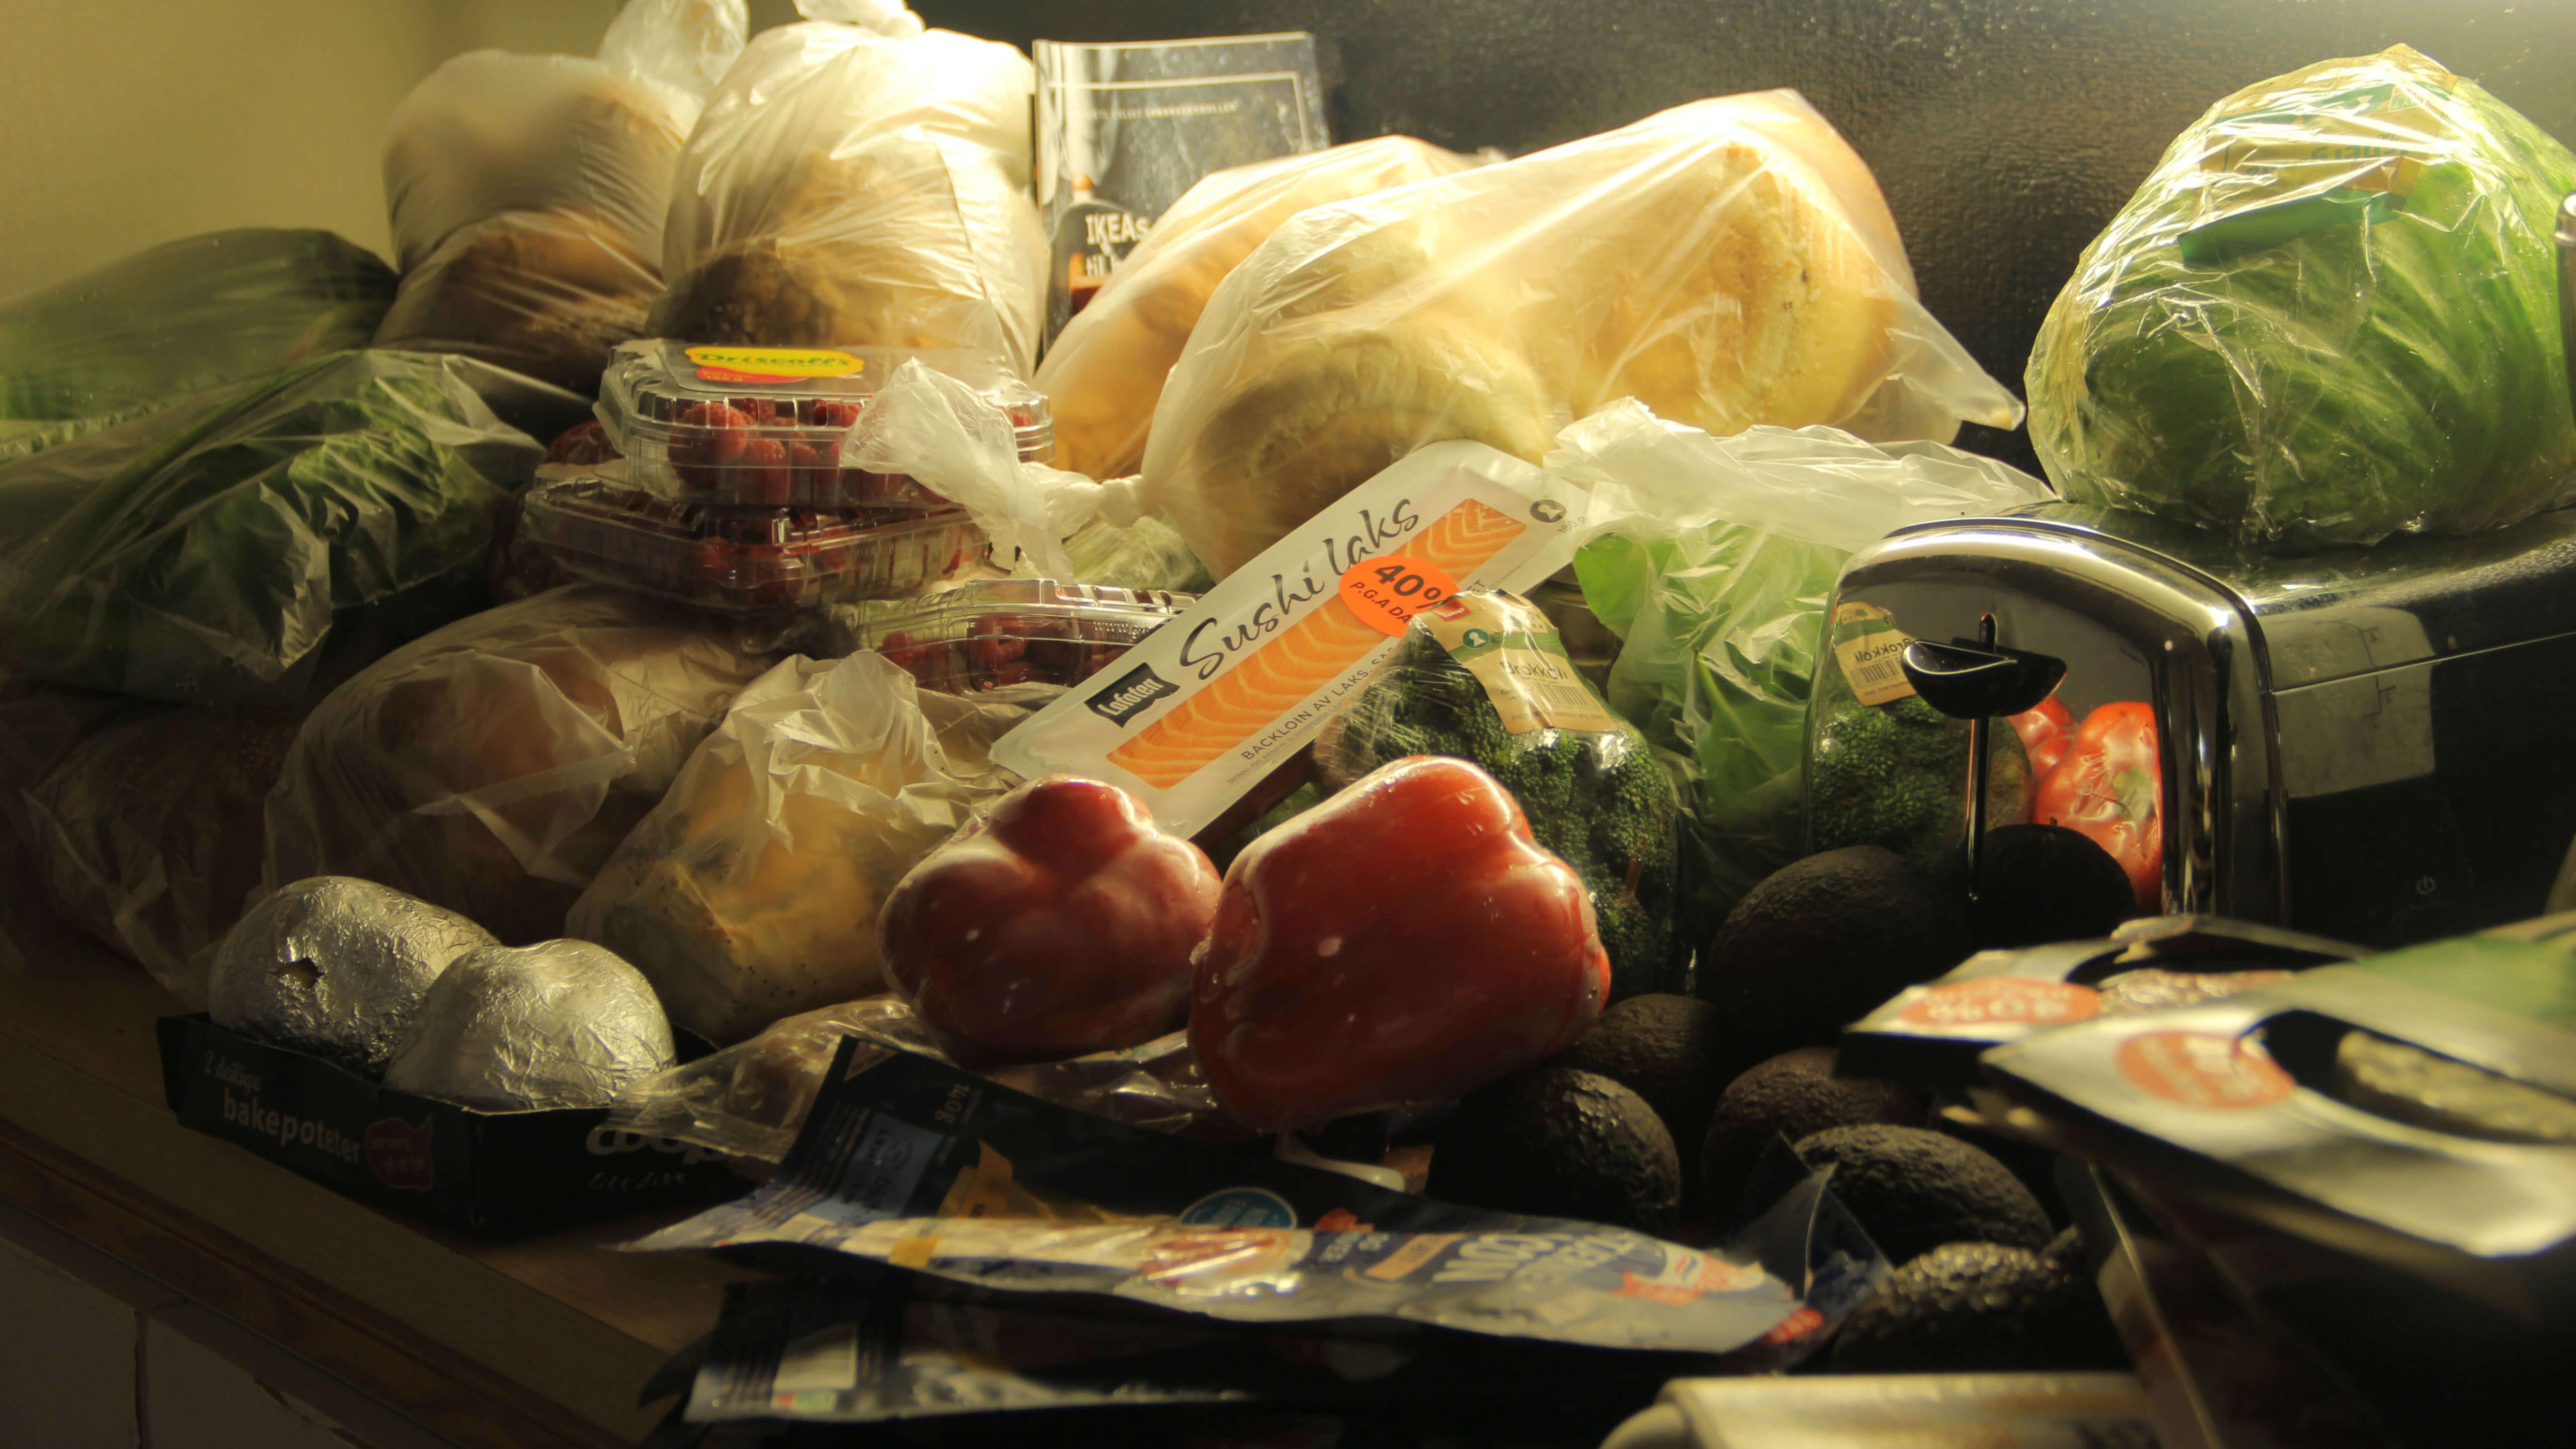 Dumpster diving: Ulovlig, men økonomisk og miljøvennlig